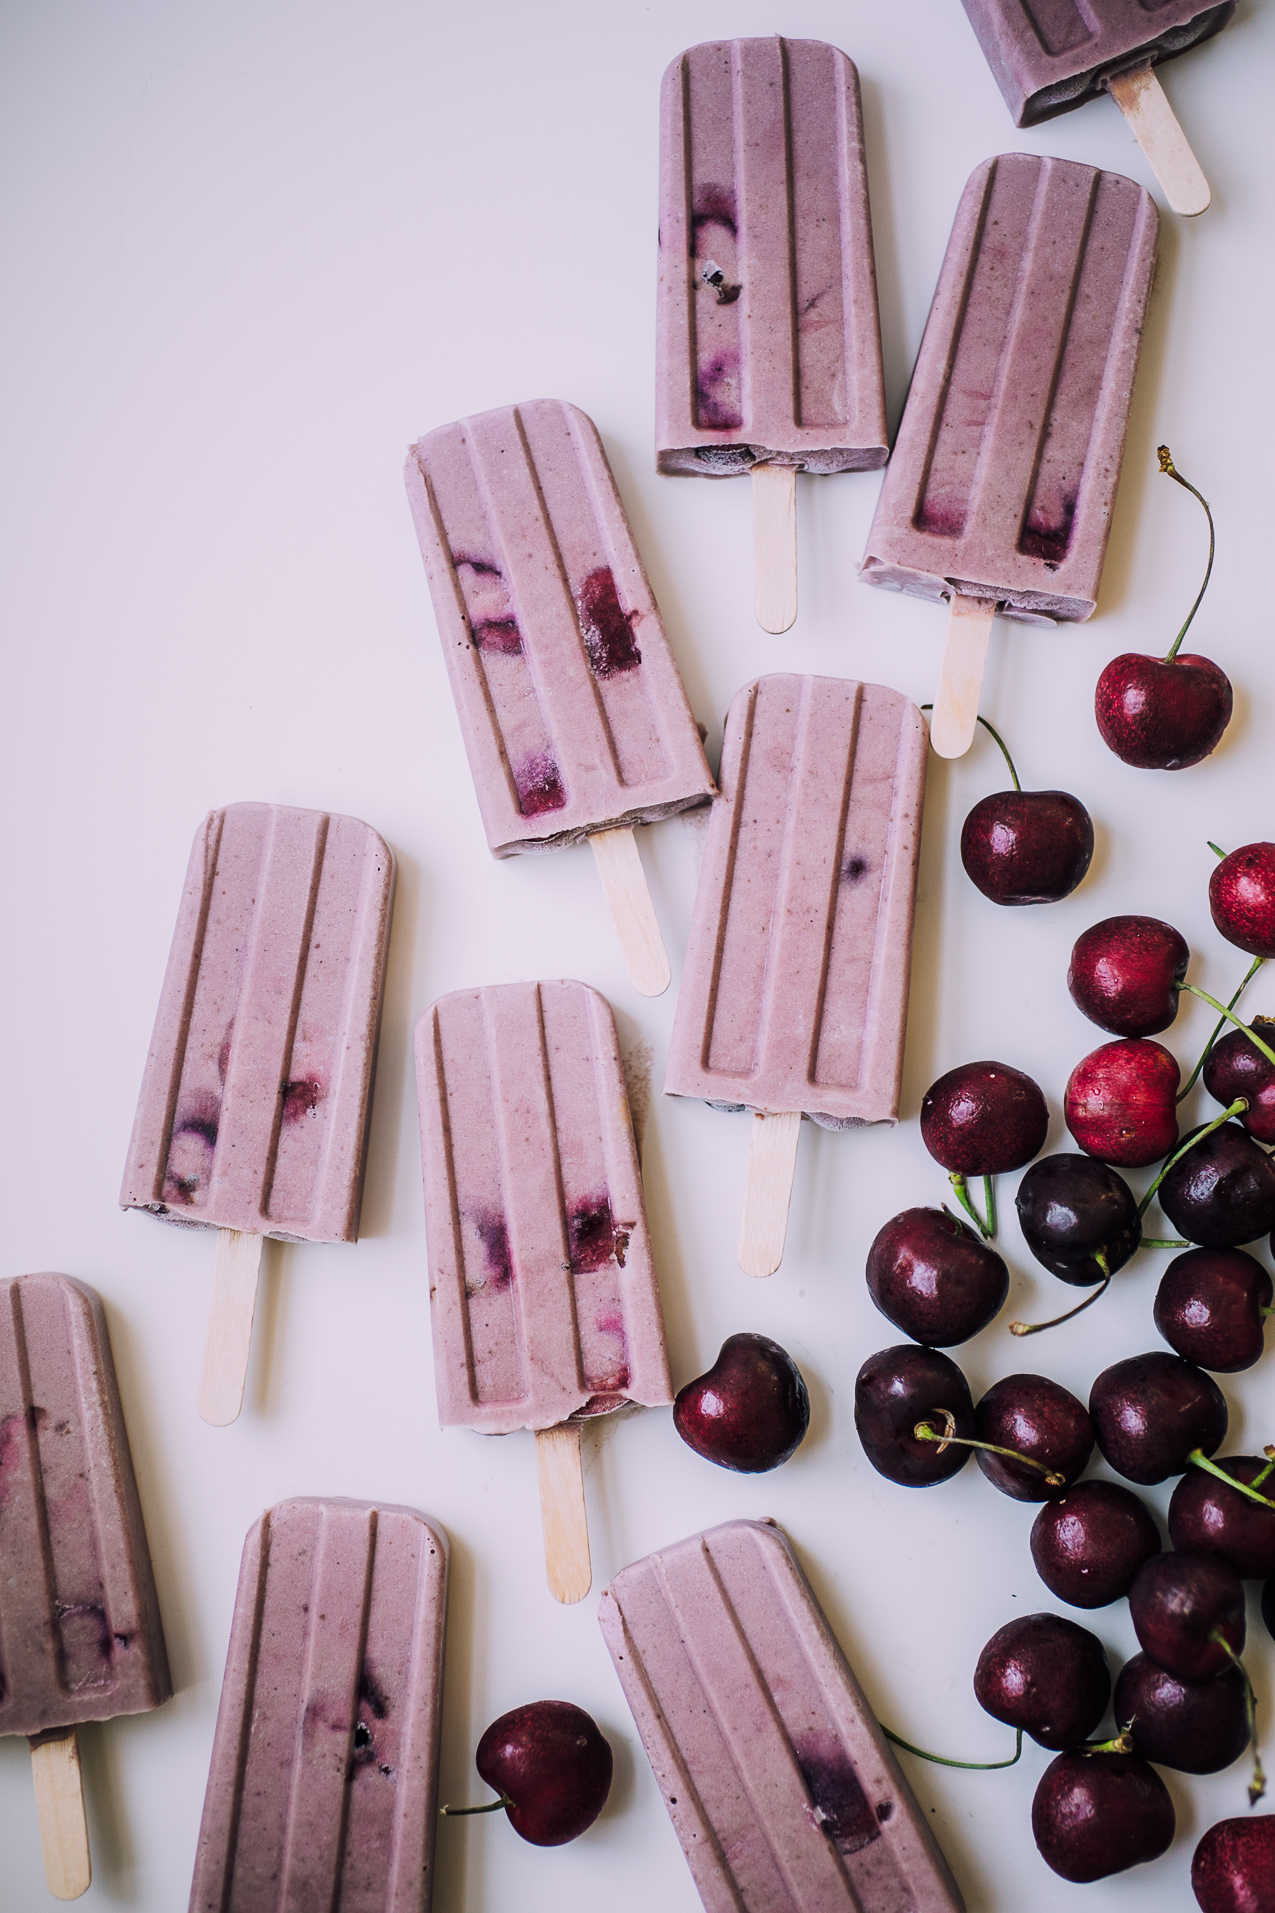 vegan-cherry-almond-popsicles-9175.jpg